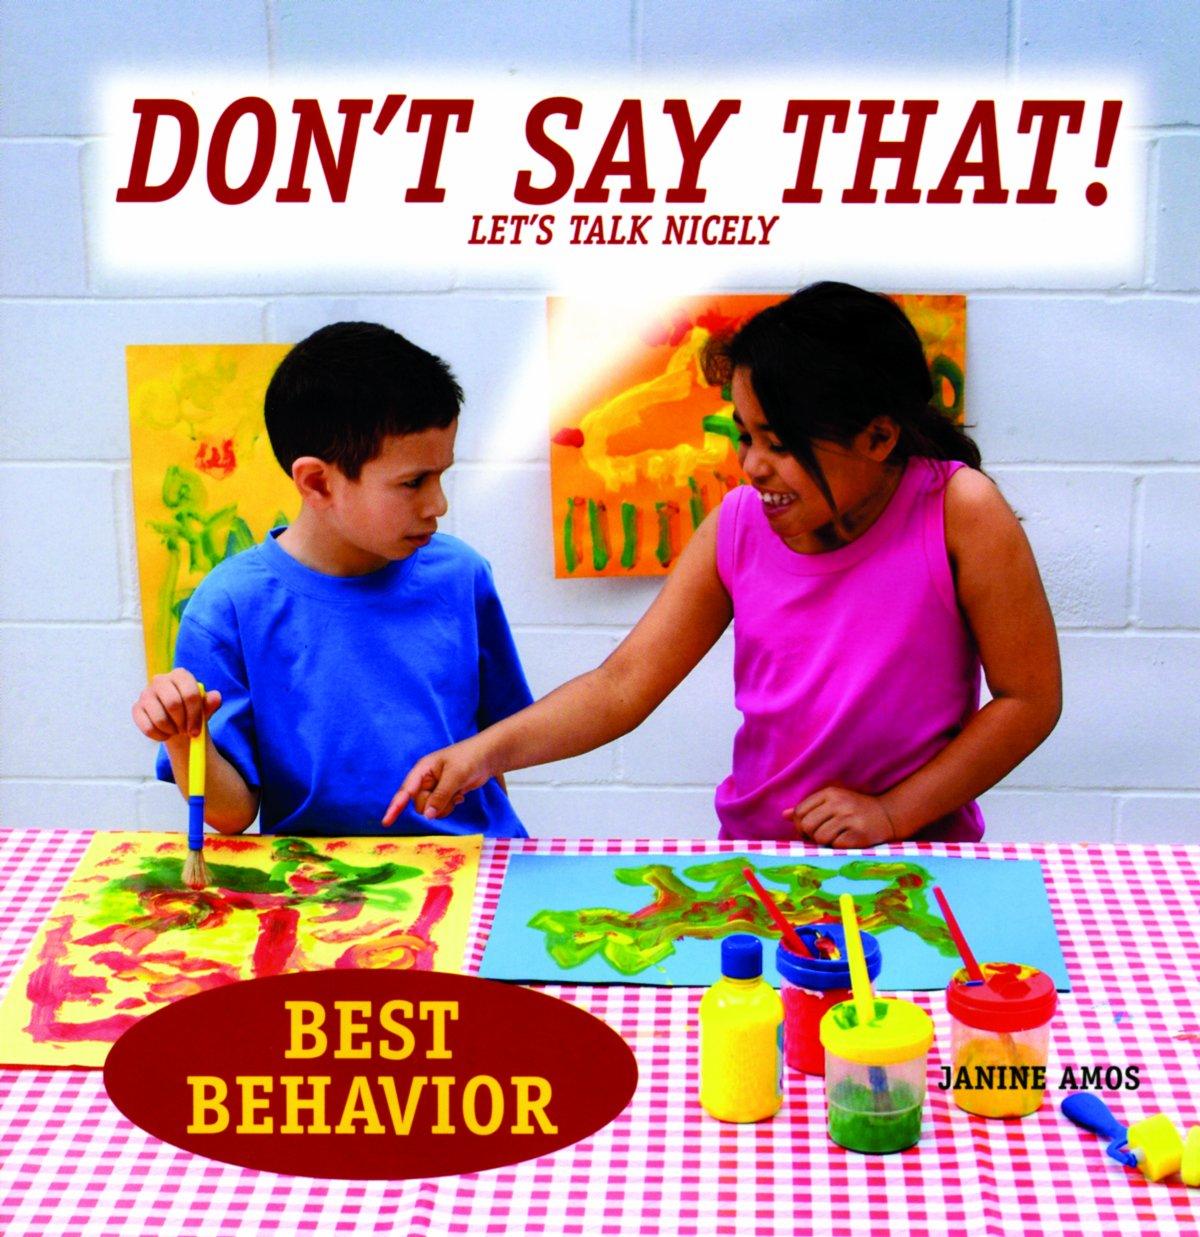 Download Don't Say That!: Let's Talk Nicely (Best Behavior) ebook